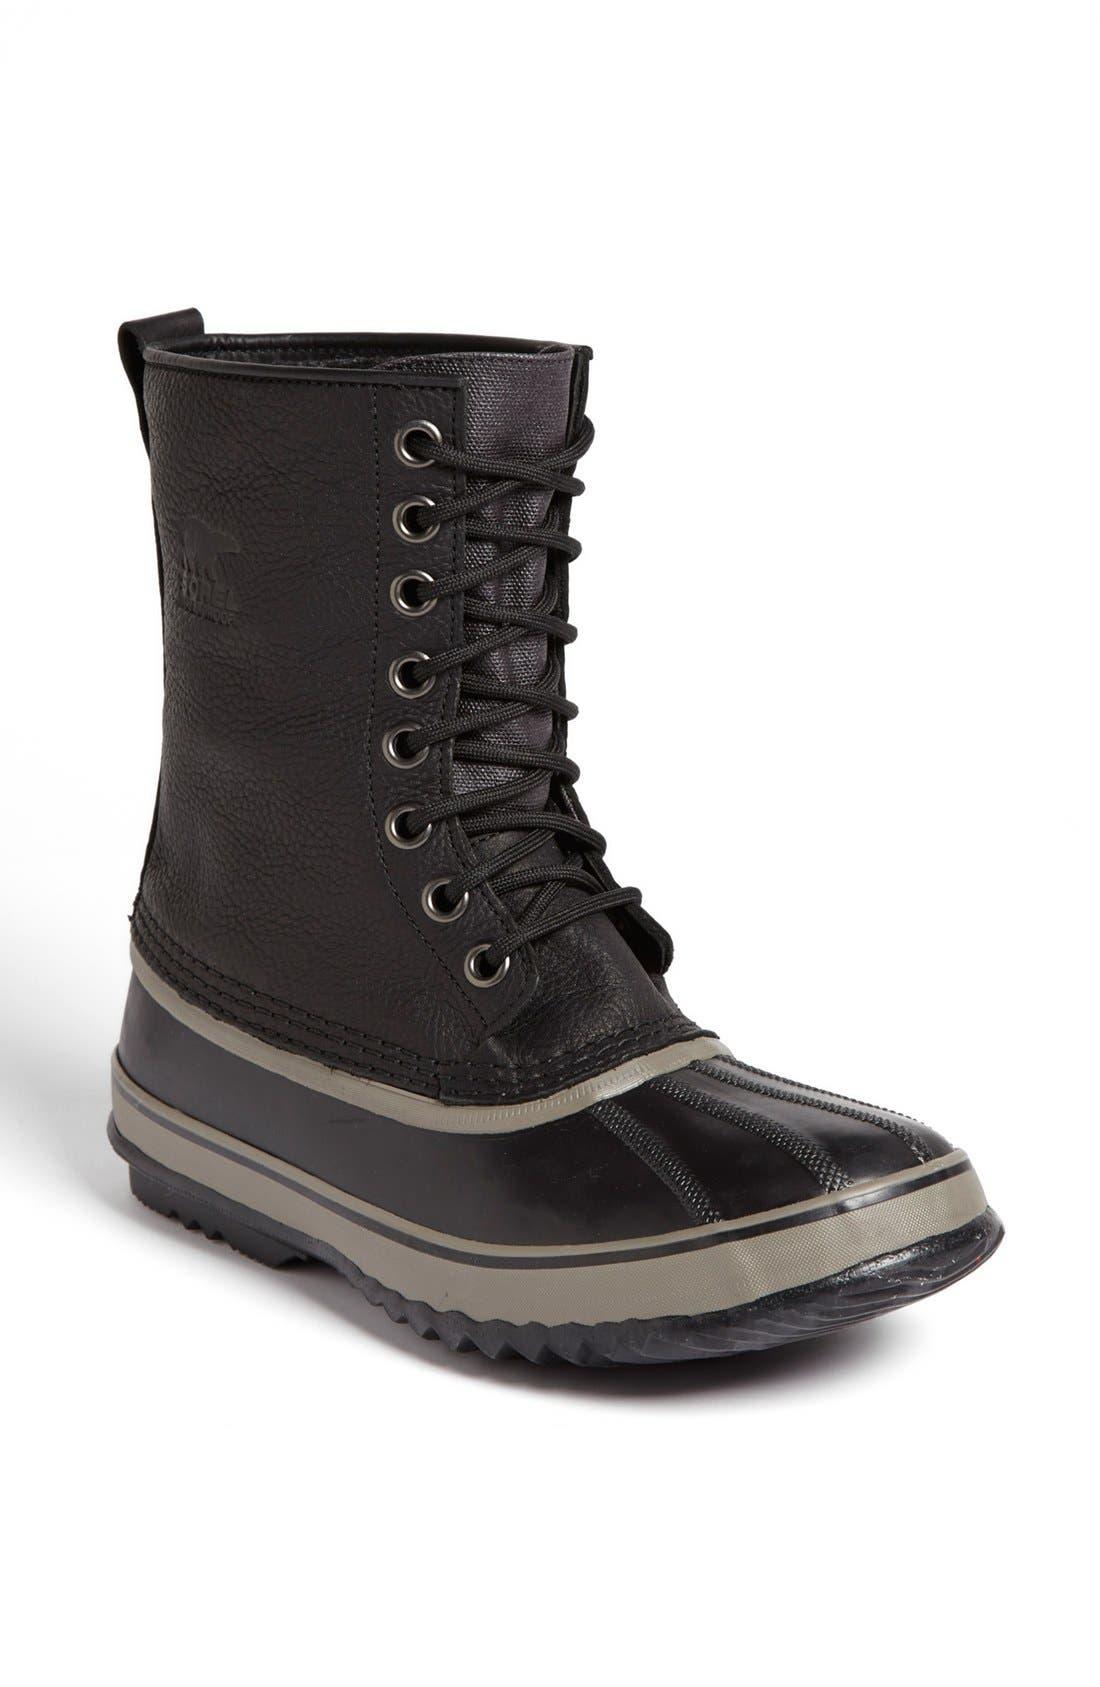 Alternate Image 1 Selected - SOREL '1964 Premium T' Snow Boot